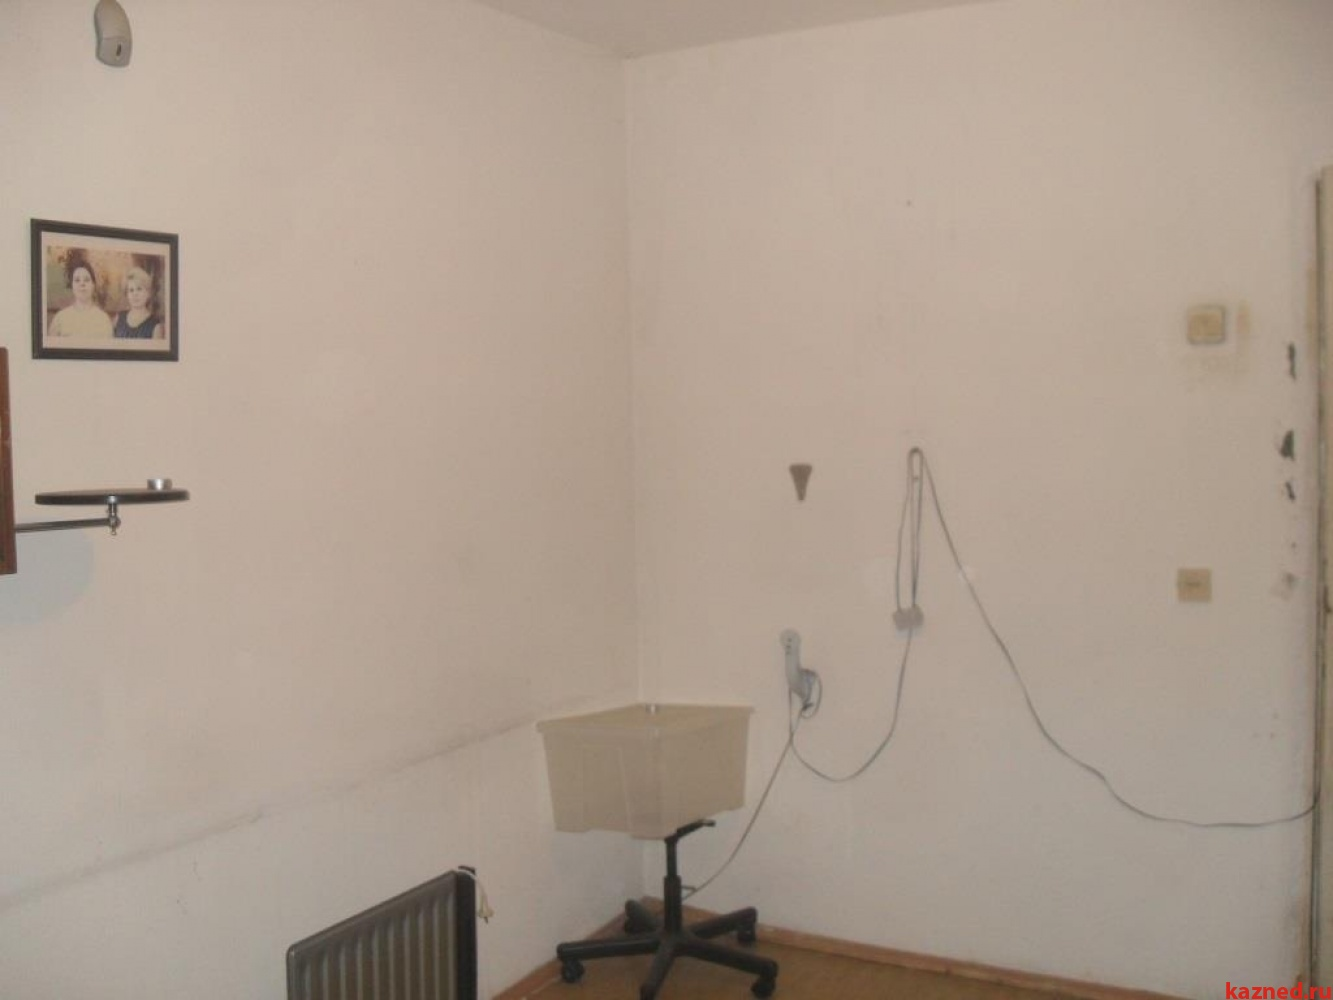 Продажа 2-к квартиры Лукина 15, 53 м²  (миниатюра №3)